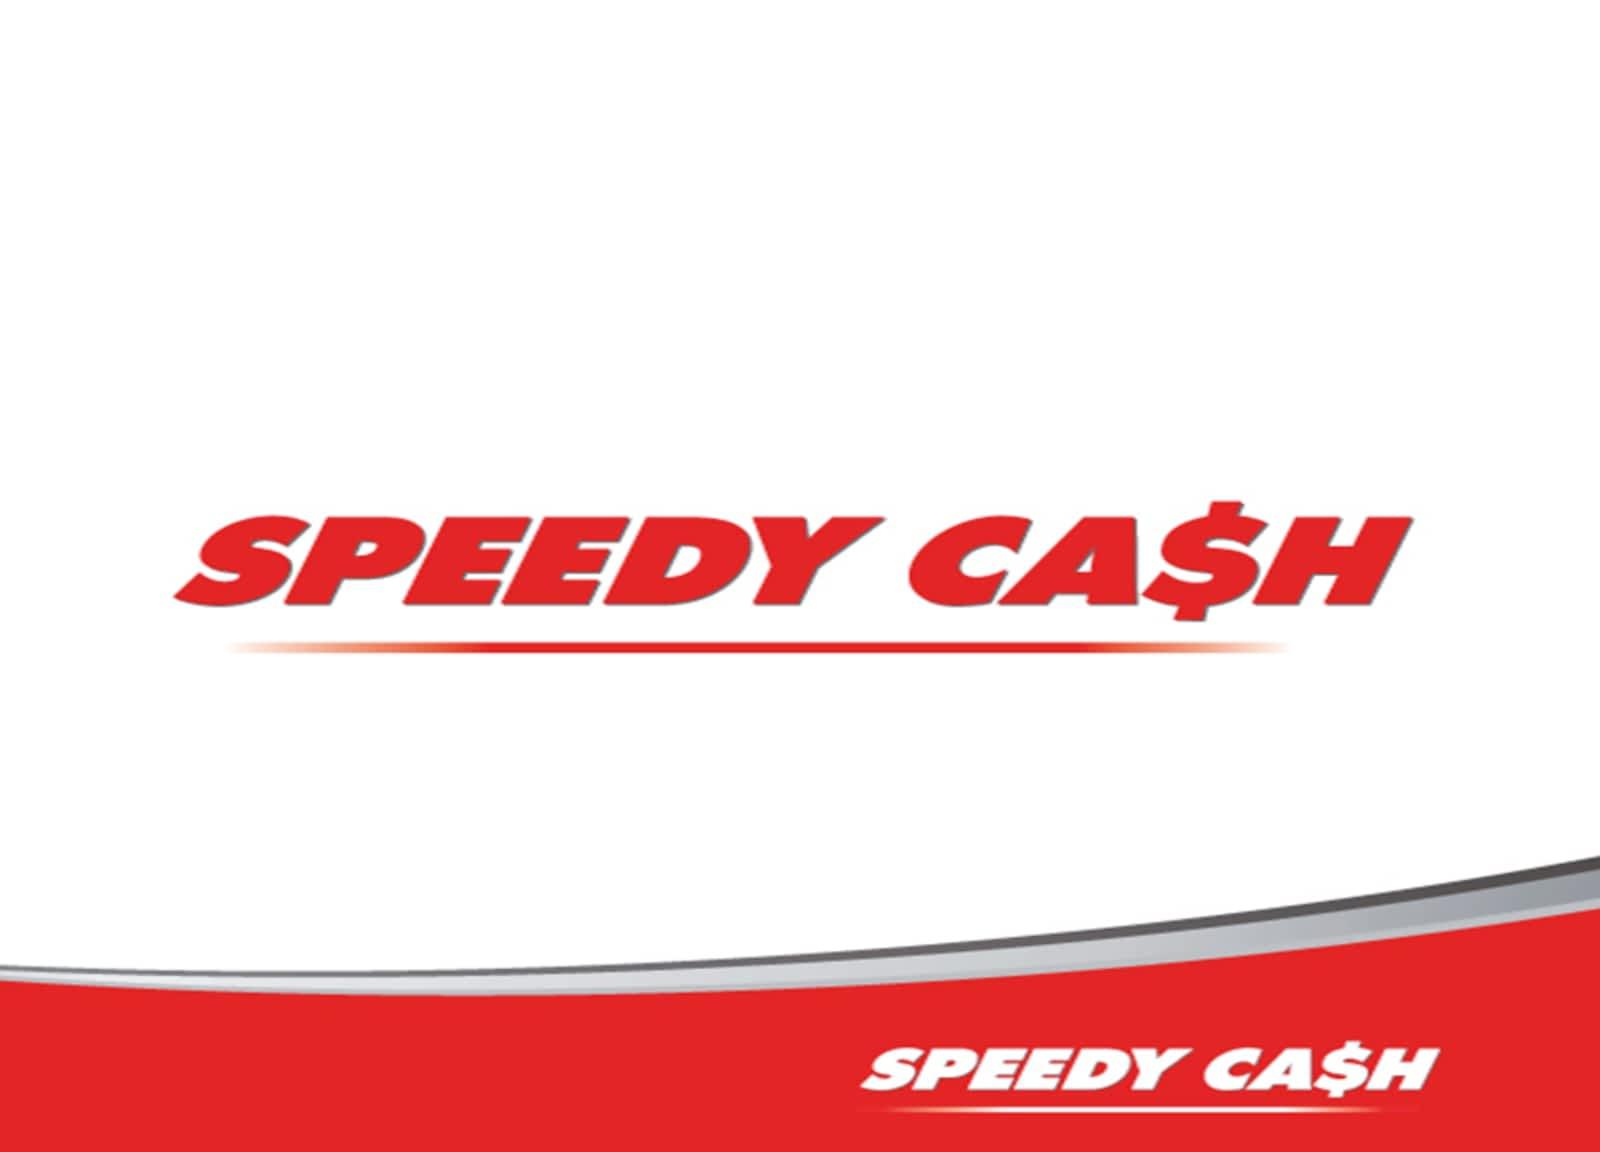 Quick cash loans in kenya image 6